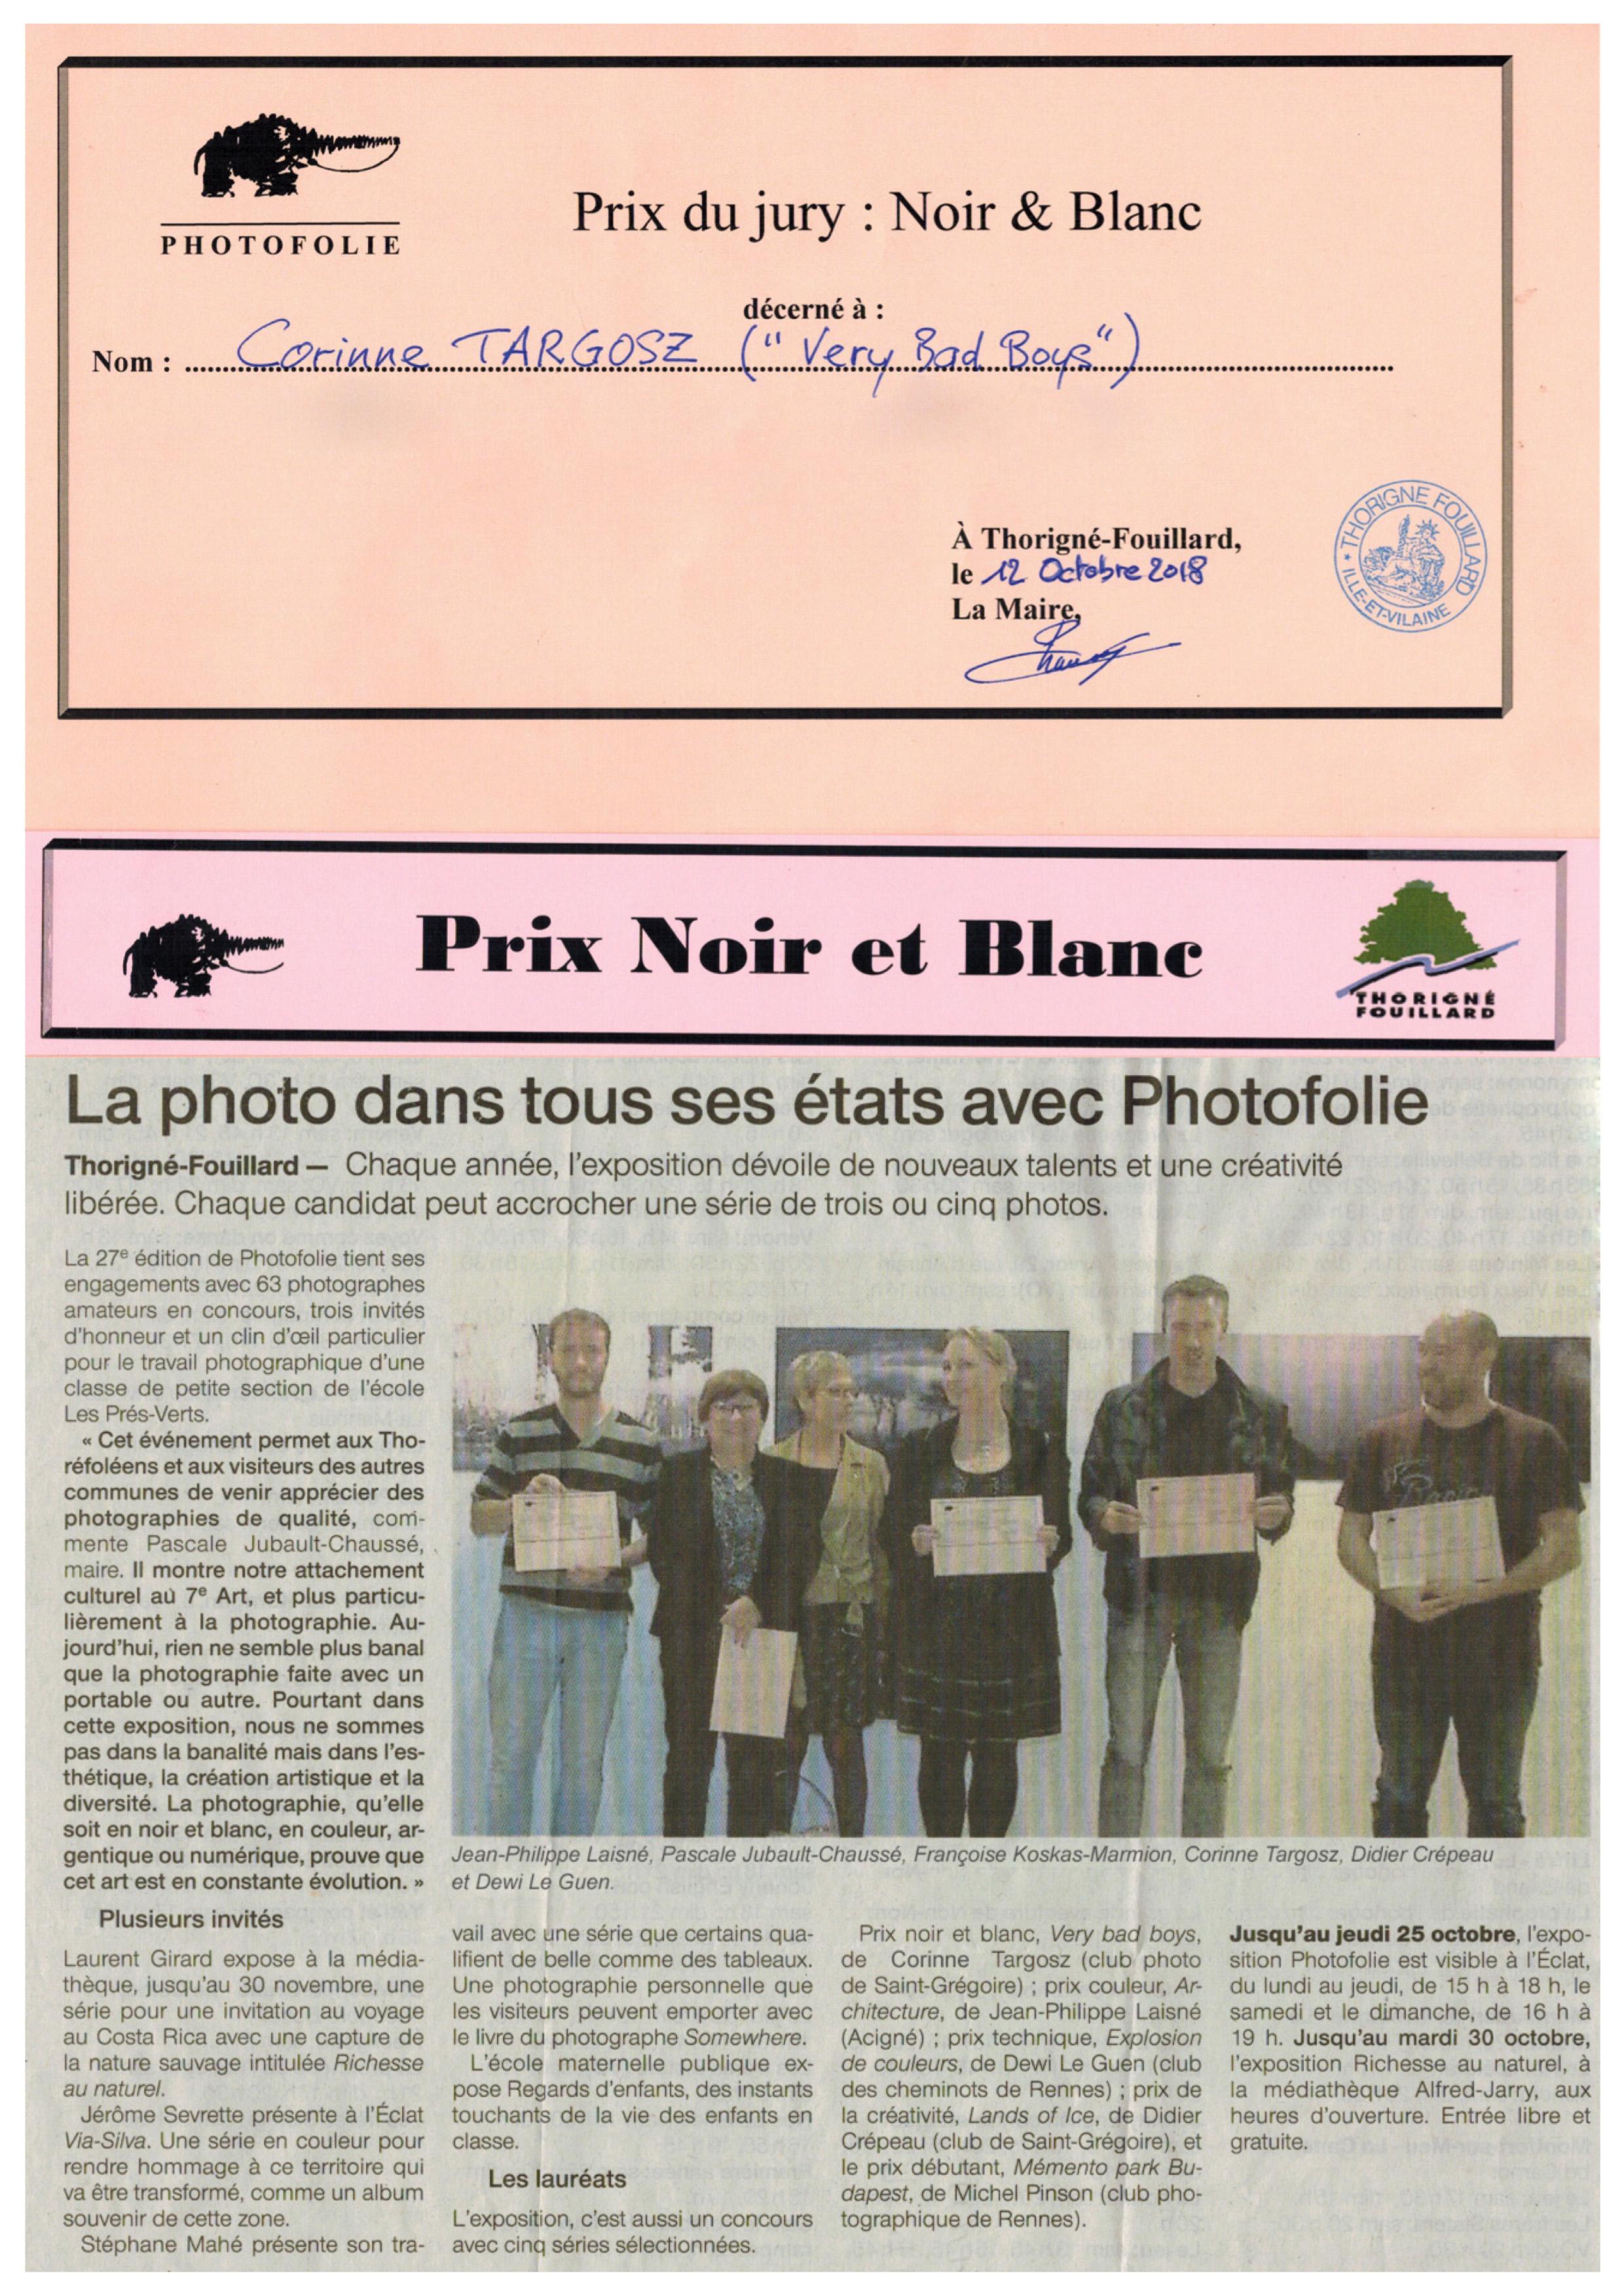 1er Prix Noir & Blanc